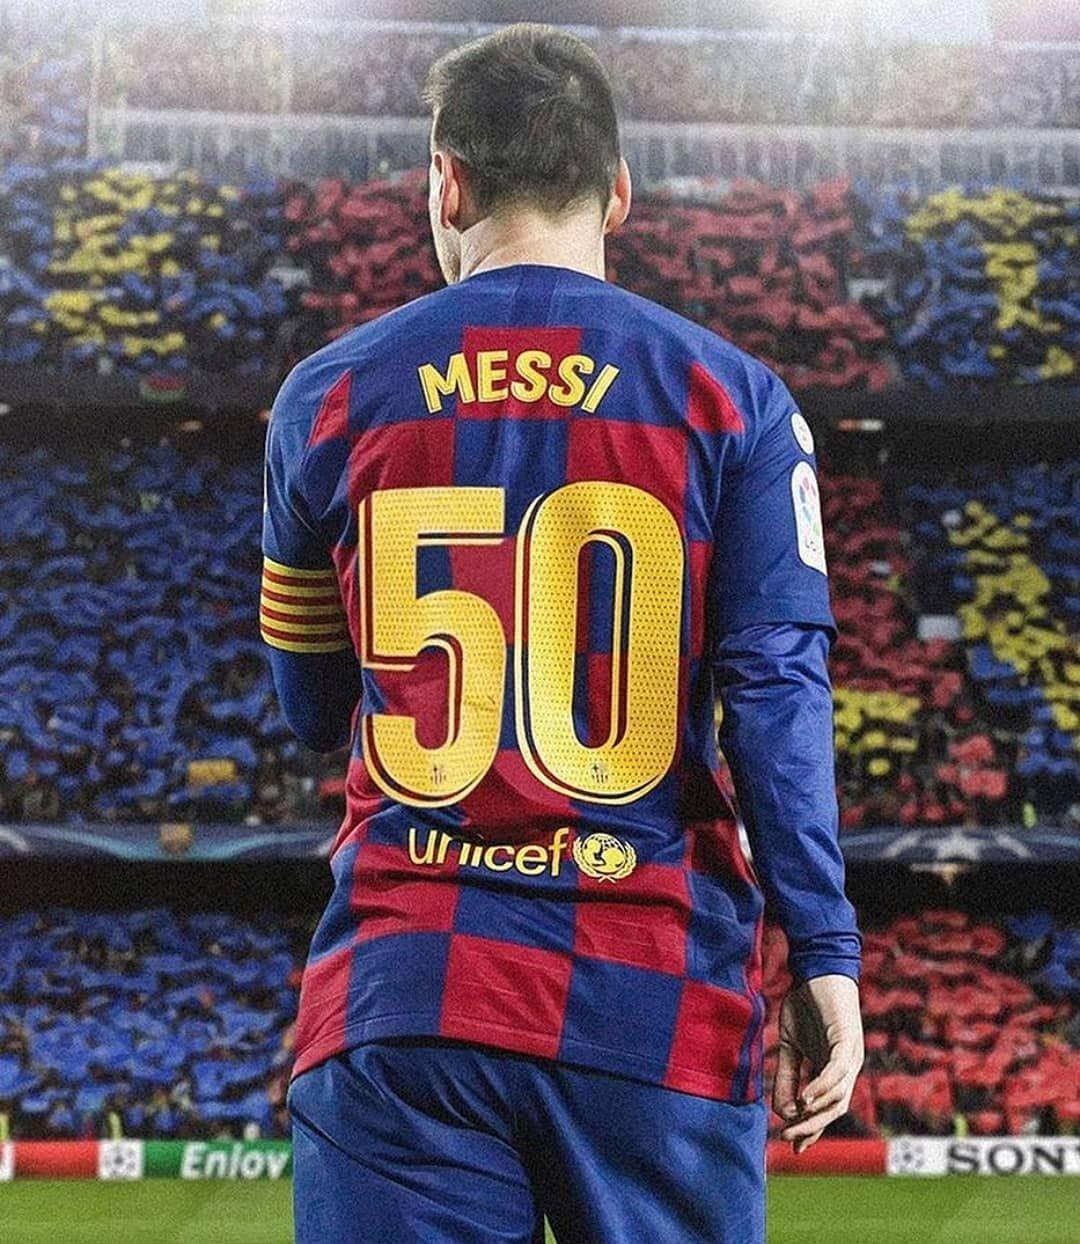 Ansu Fati Ansufati Championsleague Uefachampionsleague Legendsoftomorrow Campnou Sansiro Fcbarcelona Barca Ba Leo Messi Uefa Champions League Sports